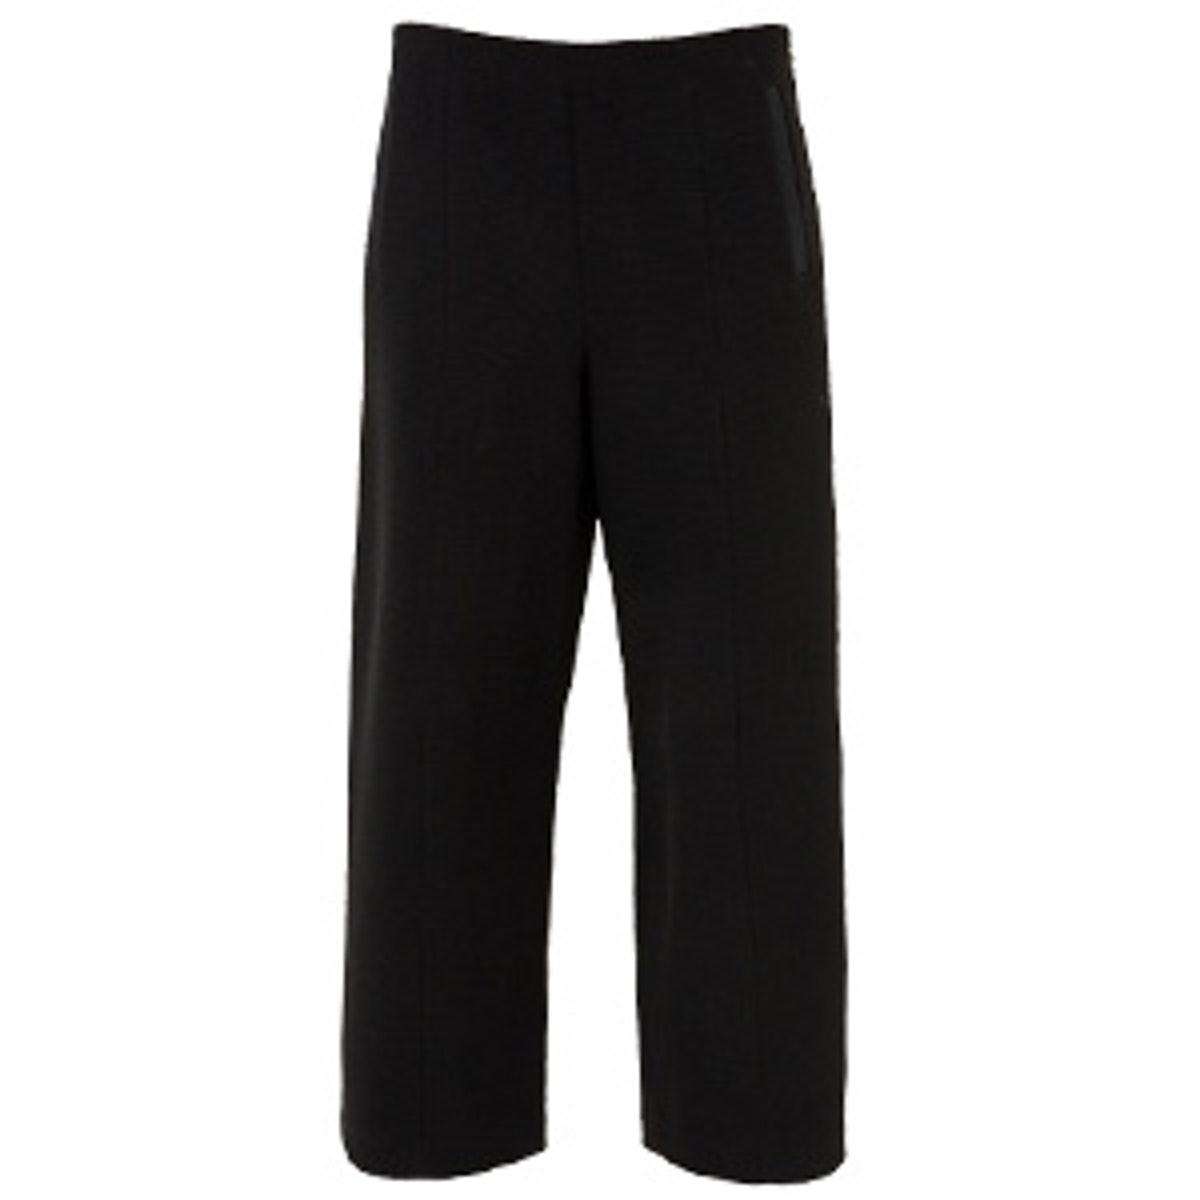 Textured Slim Fit Pants